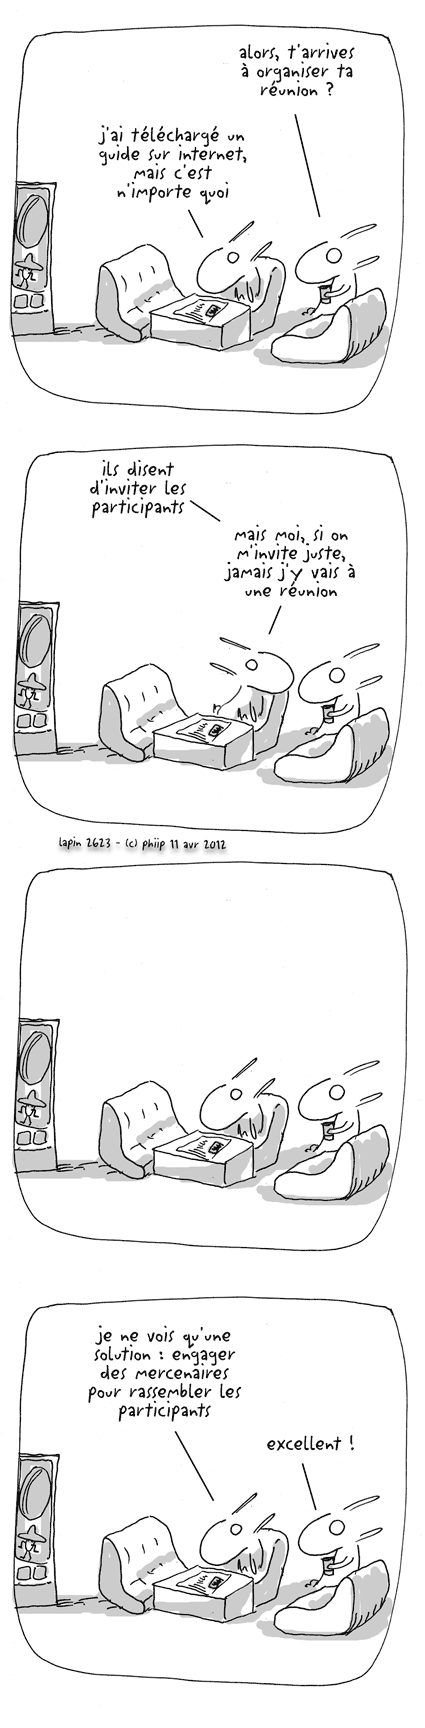 Organiser une réunion, par phiip